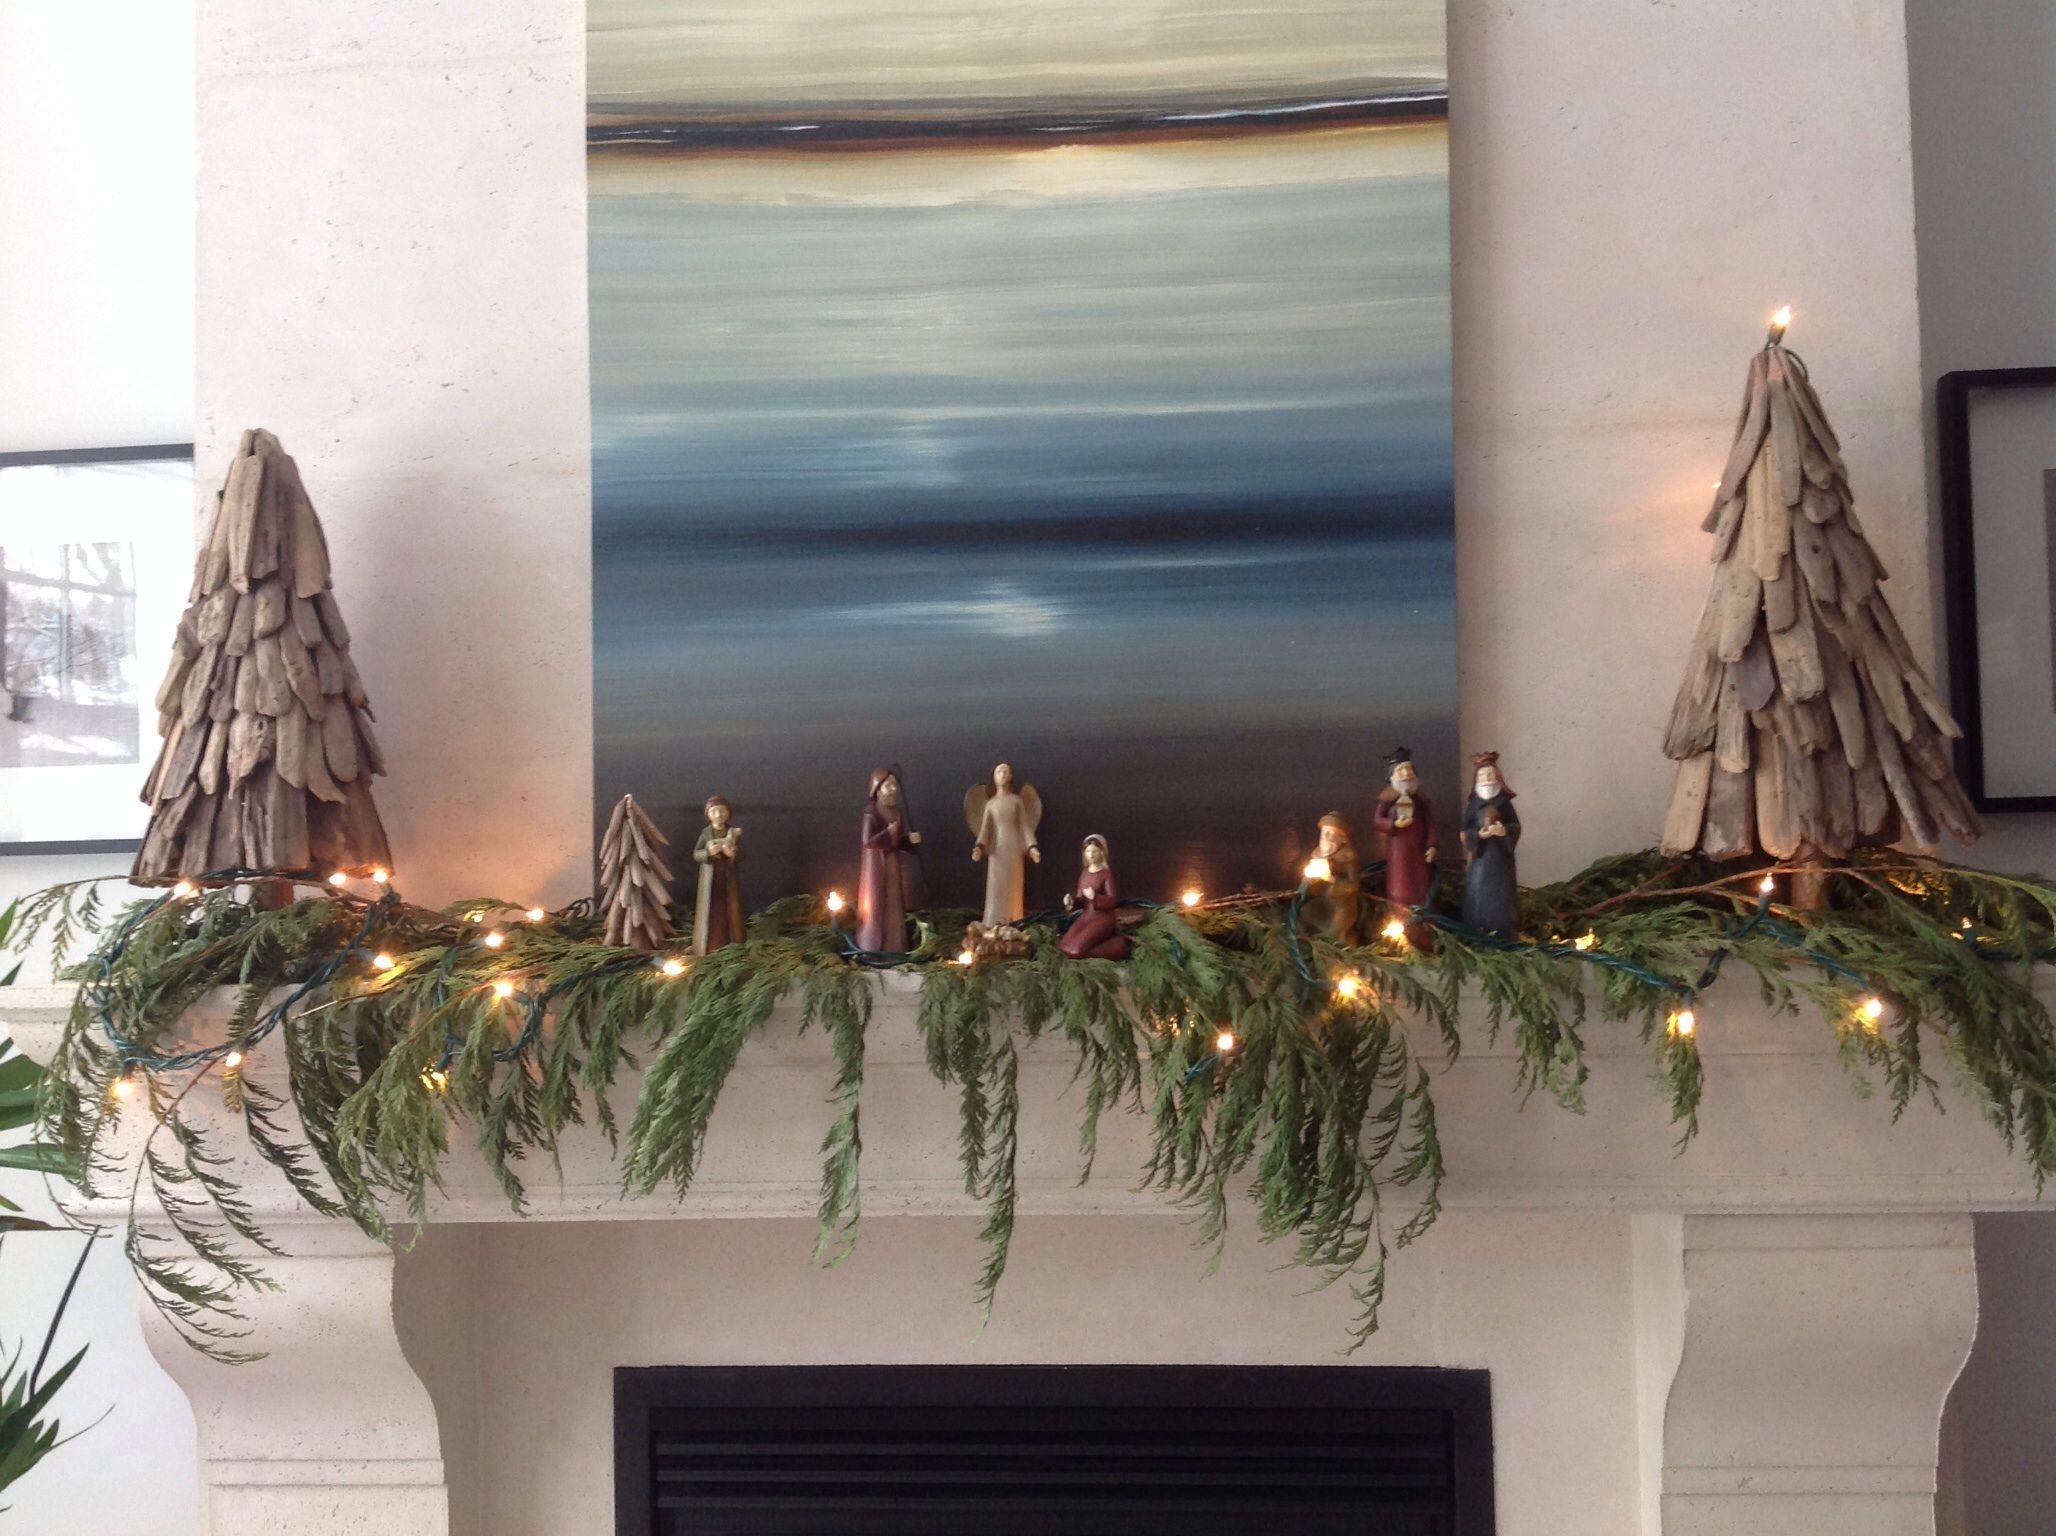 Fireplace Mantel Nativity Scene Christmas Decorations Christmas Nativity Holiday Decor